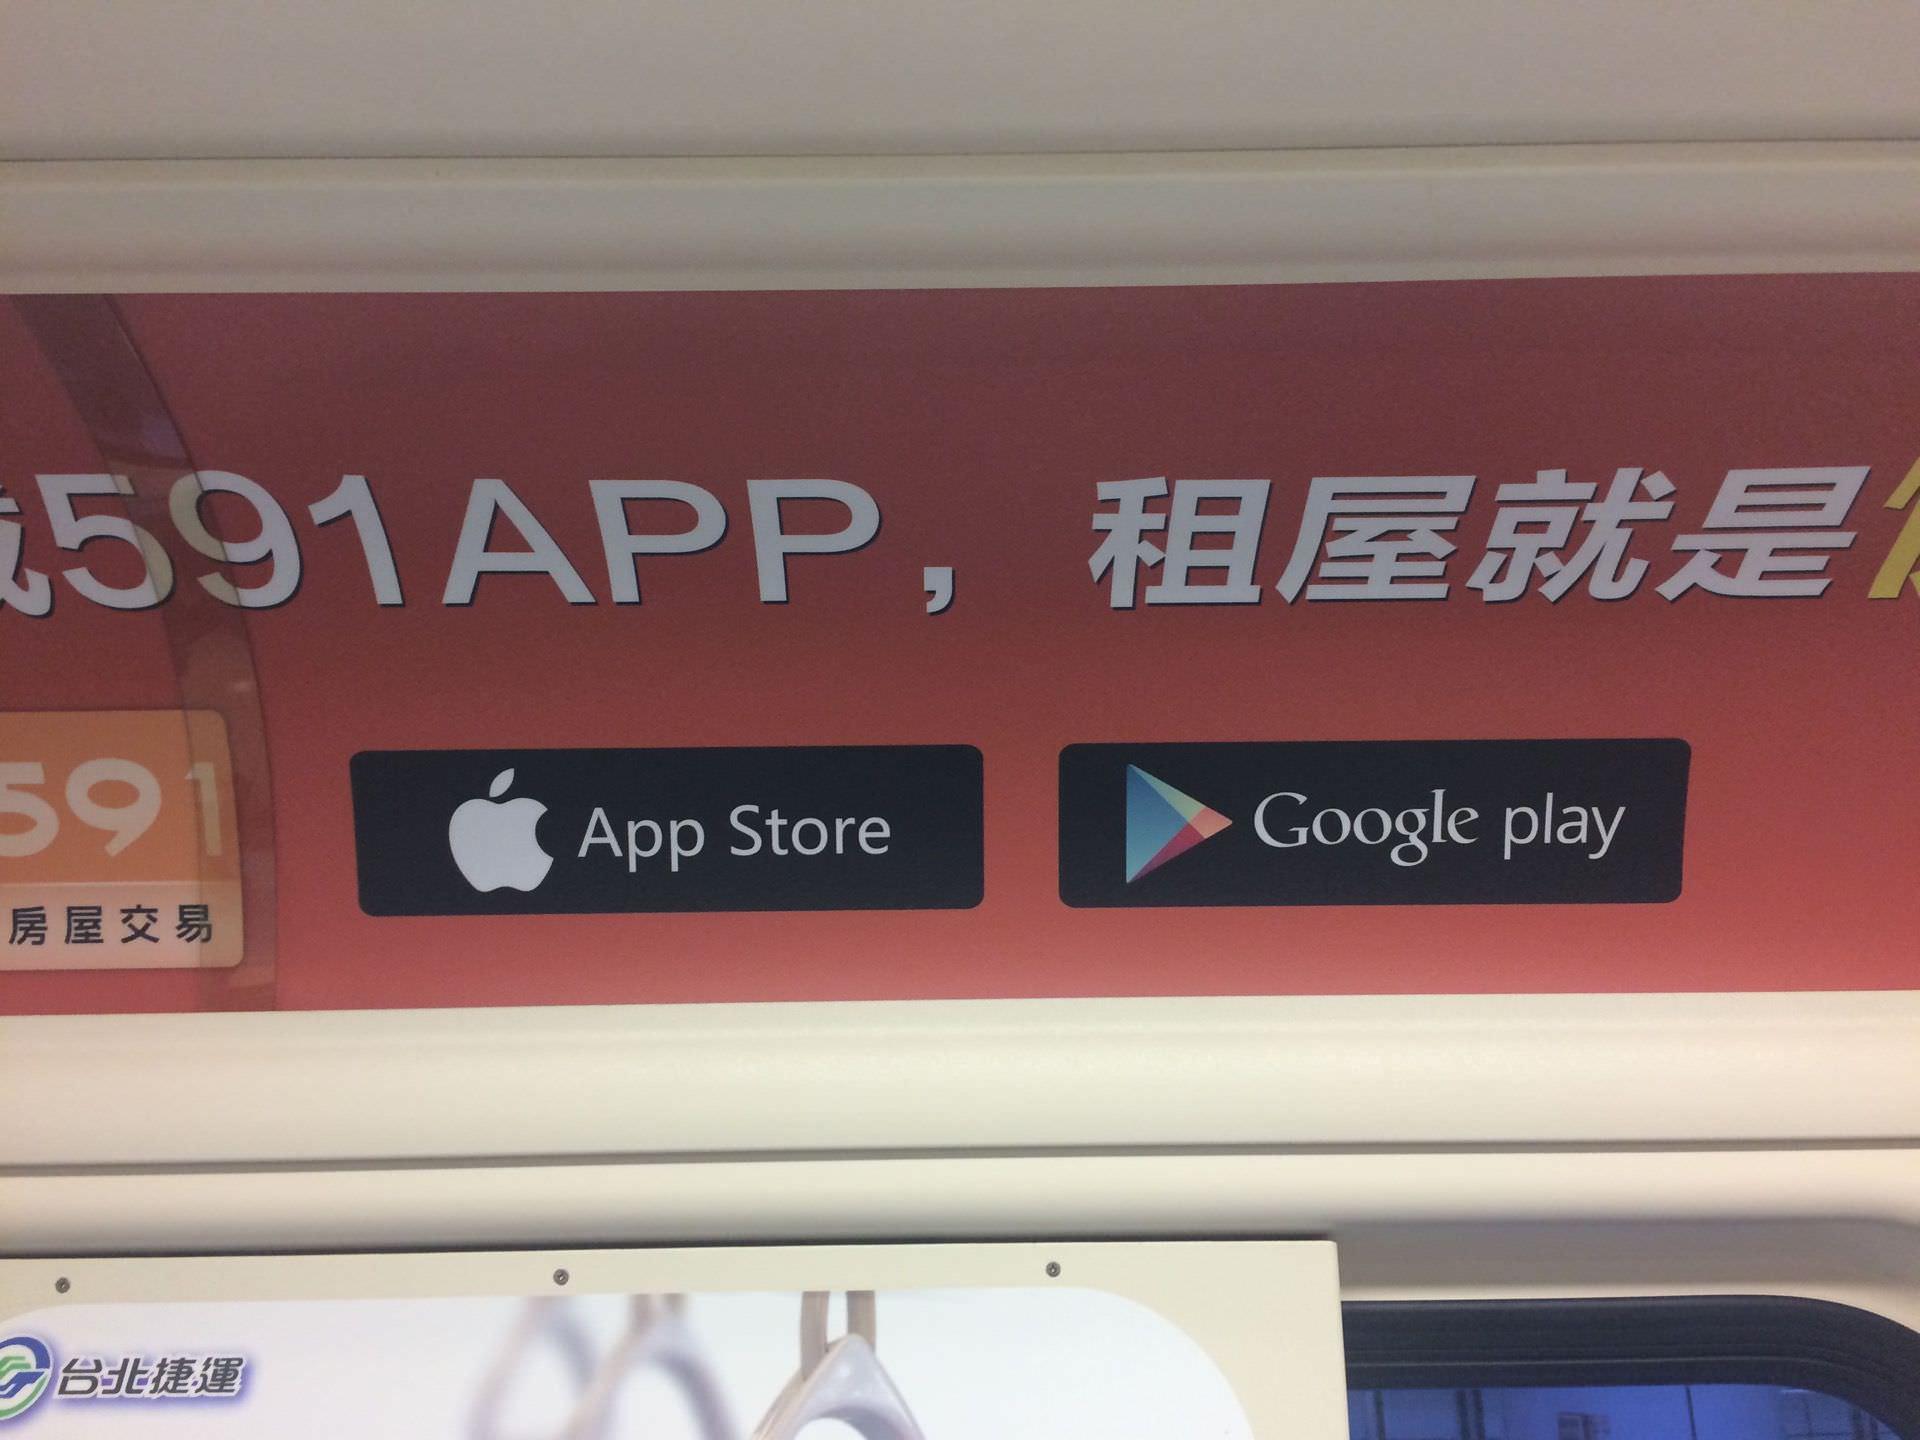 591-app-1-taipei-mrt-ad